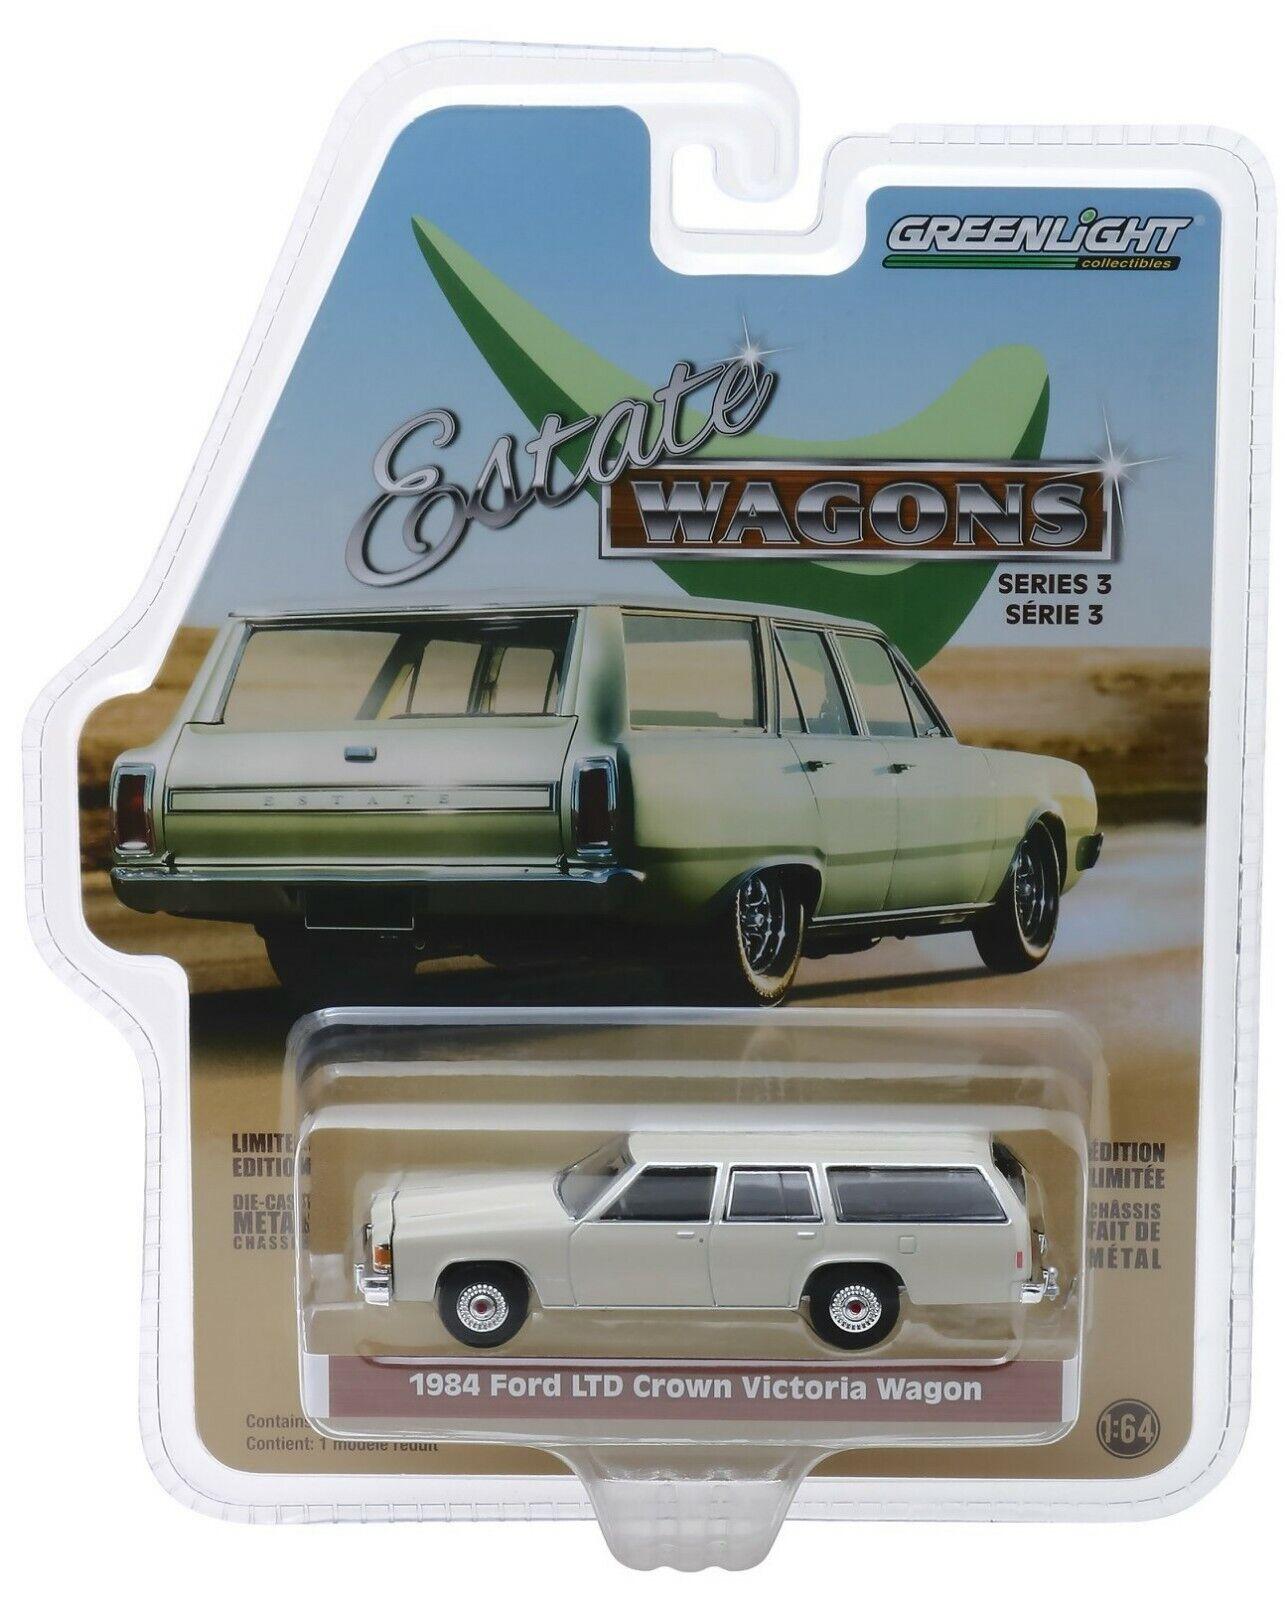 Greenlight 1984 Ford LTD Crown Victoria Wagon in Pastel Dese